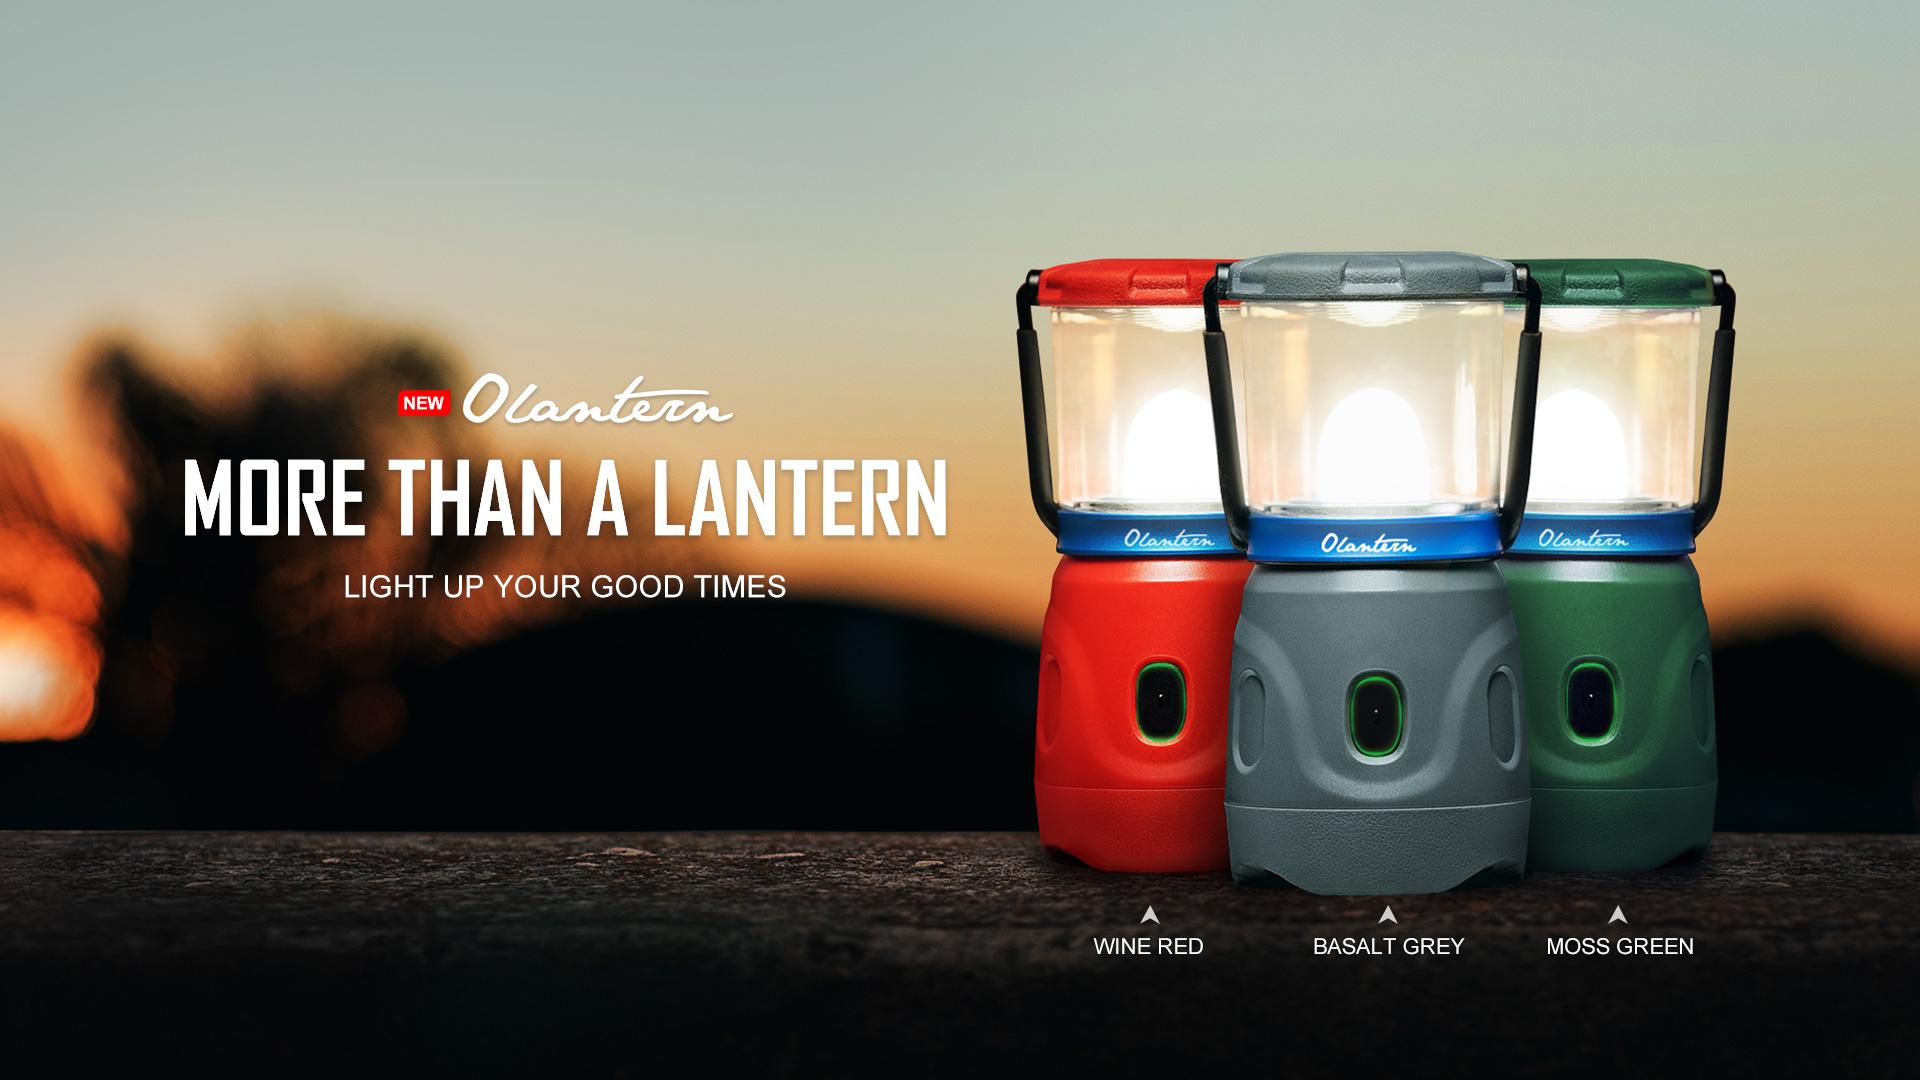 halloween sale,lantern,camping